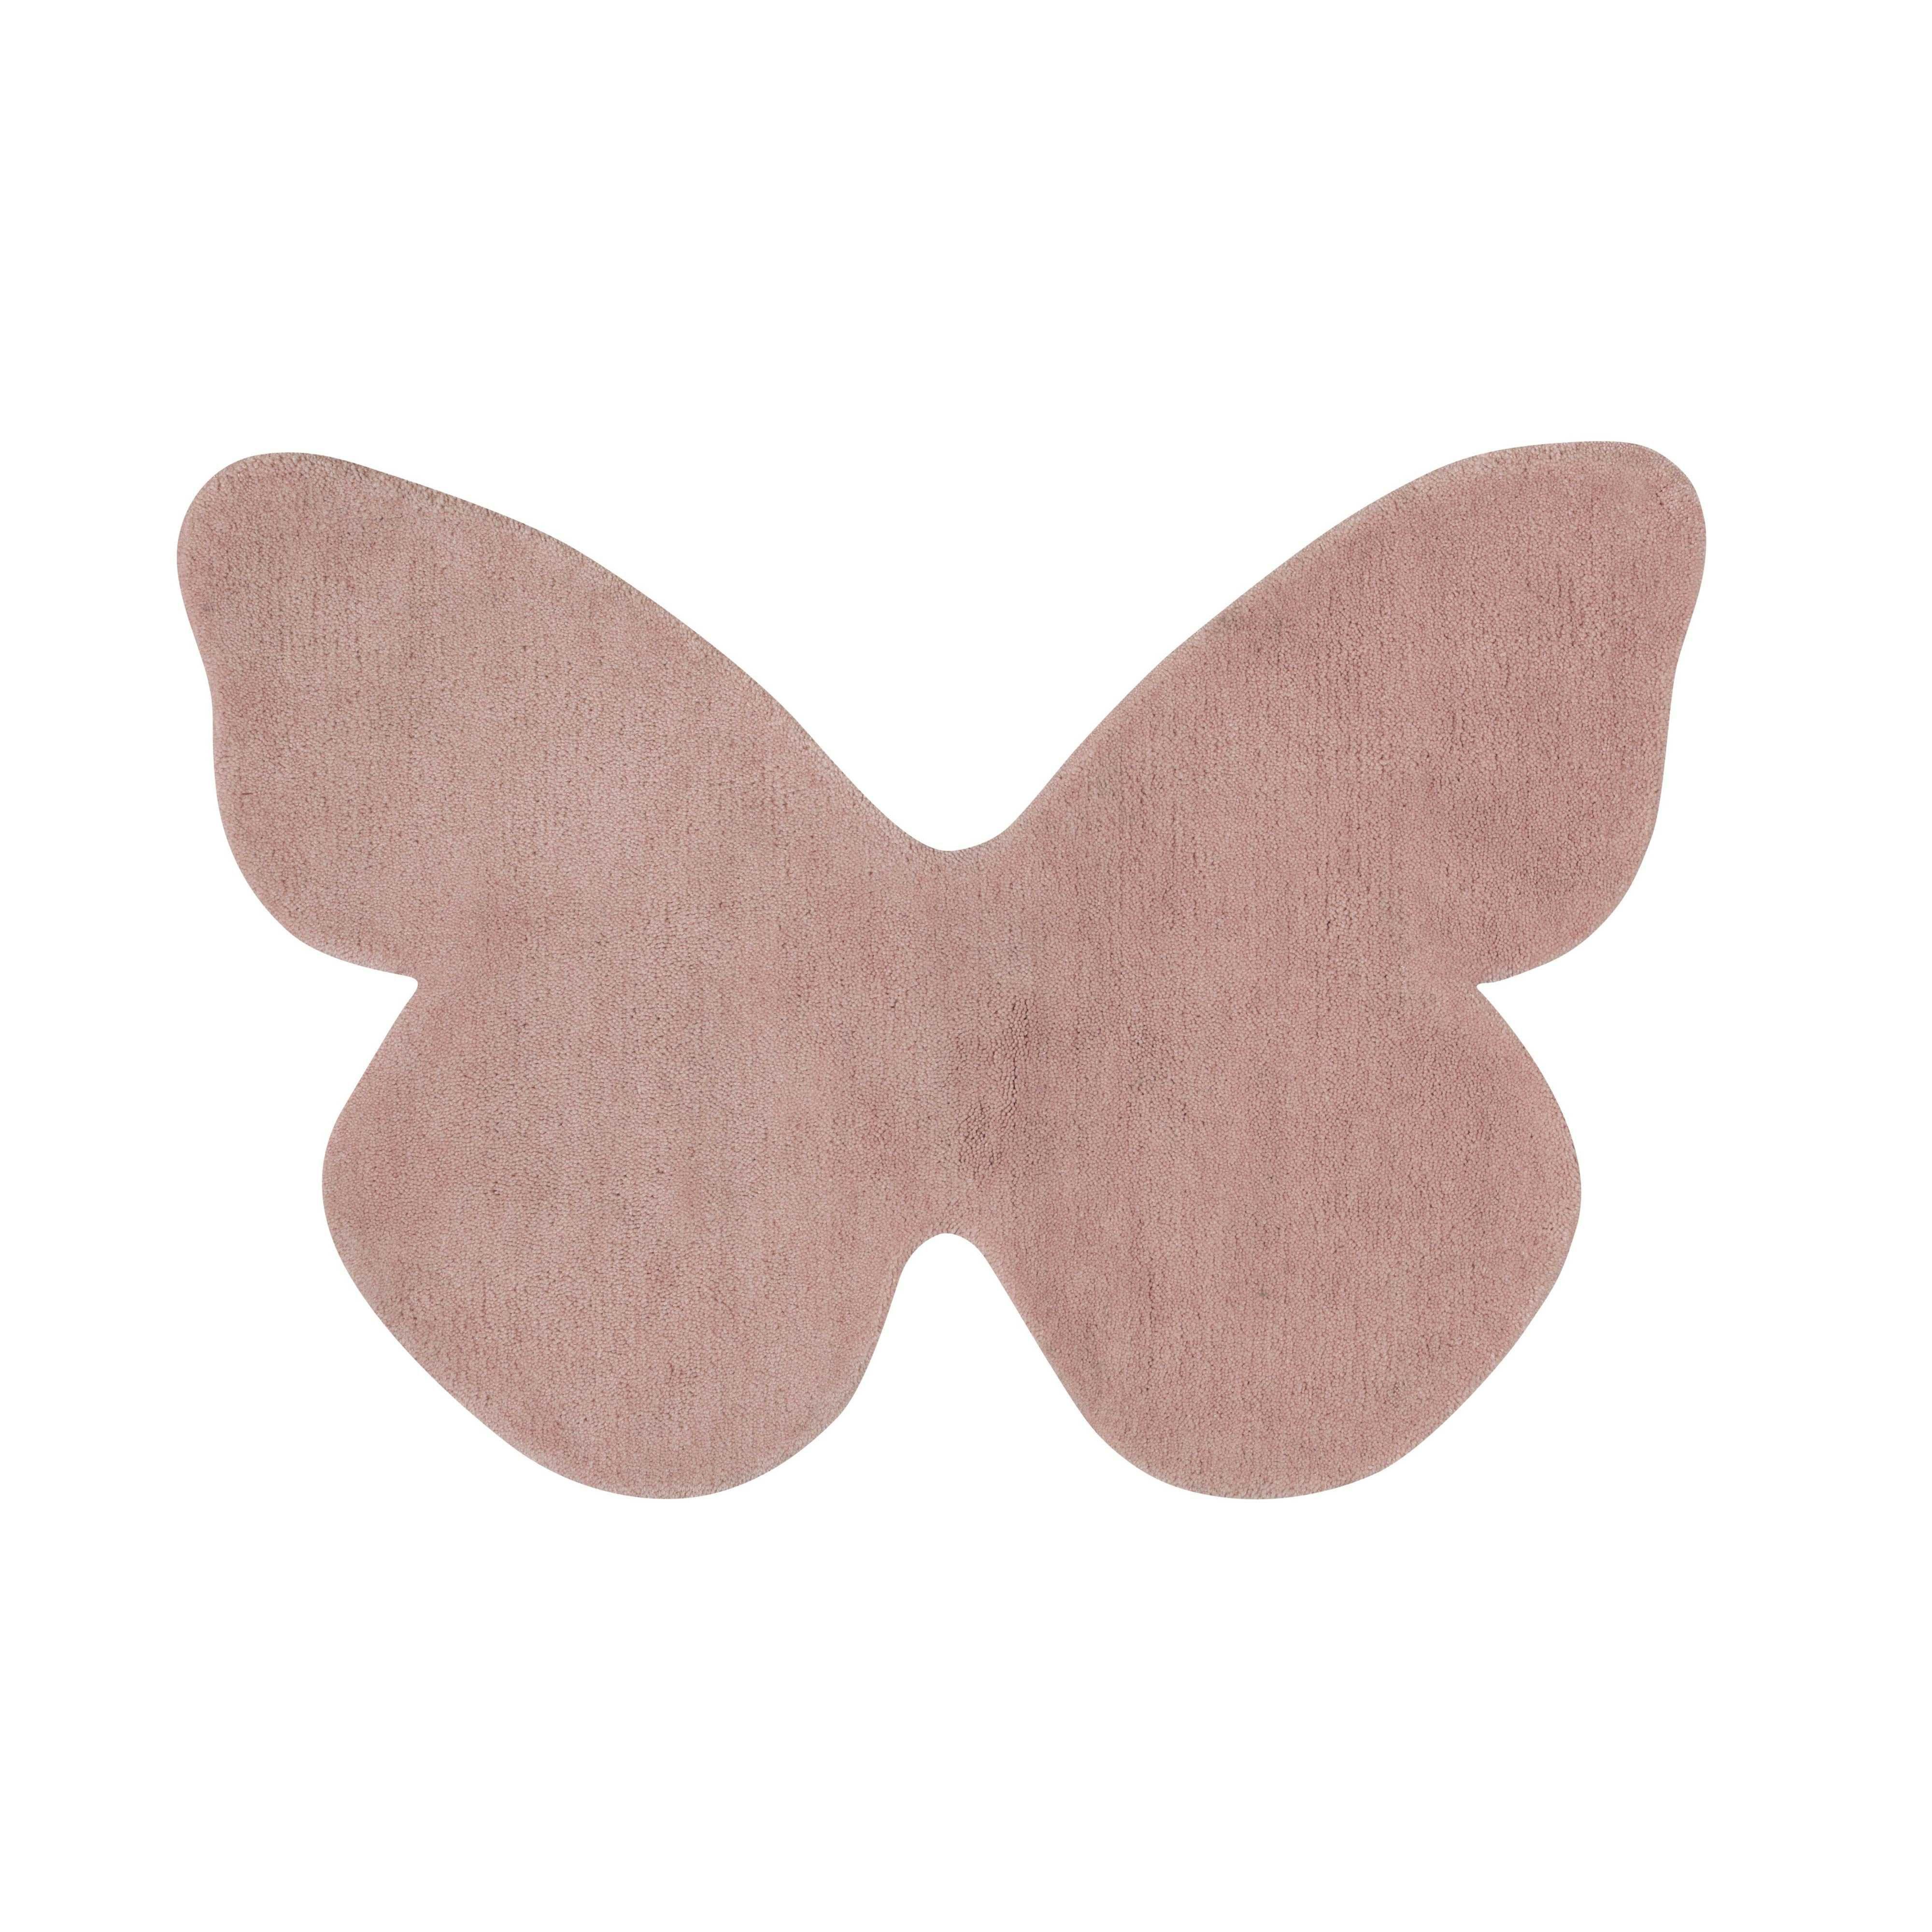 Teppich Schmetterling Rosa 60 X 85 Cm Jetzt Bestellen Unter Https Moebel